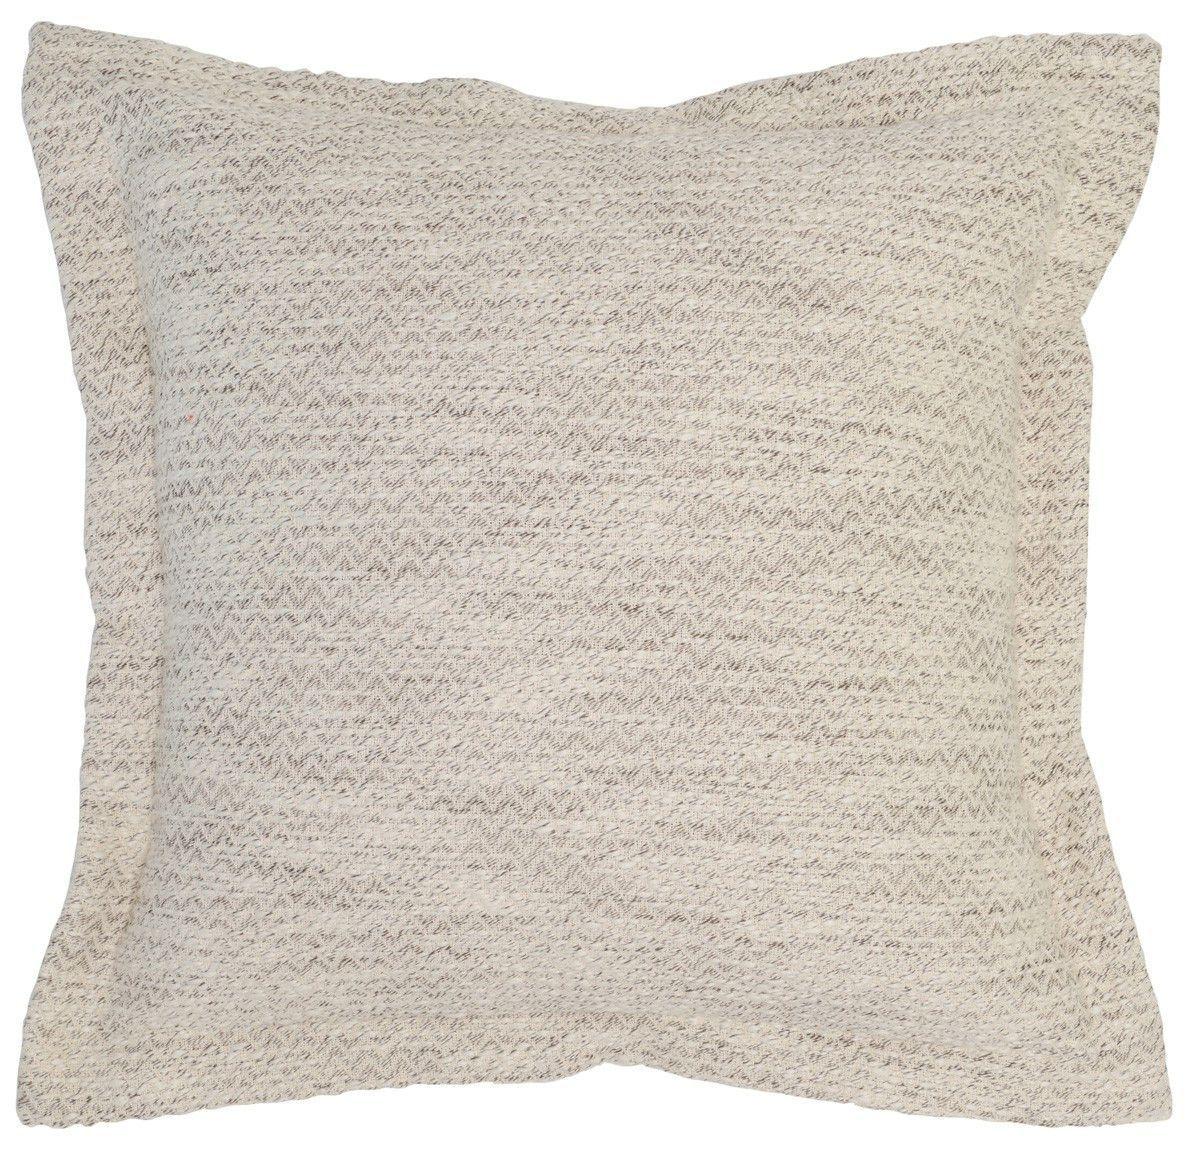 Brady bone multi x pillow design by villa home products